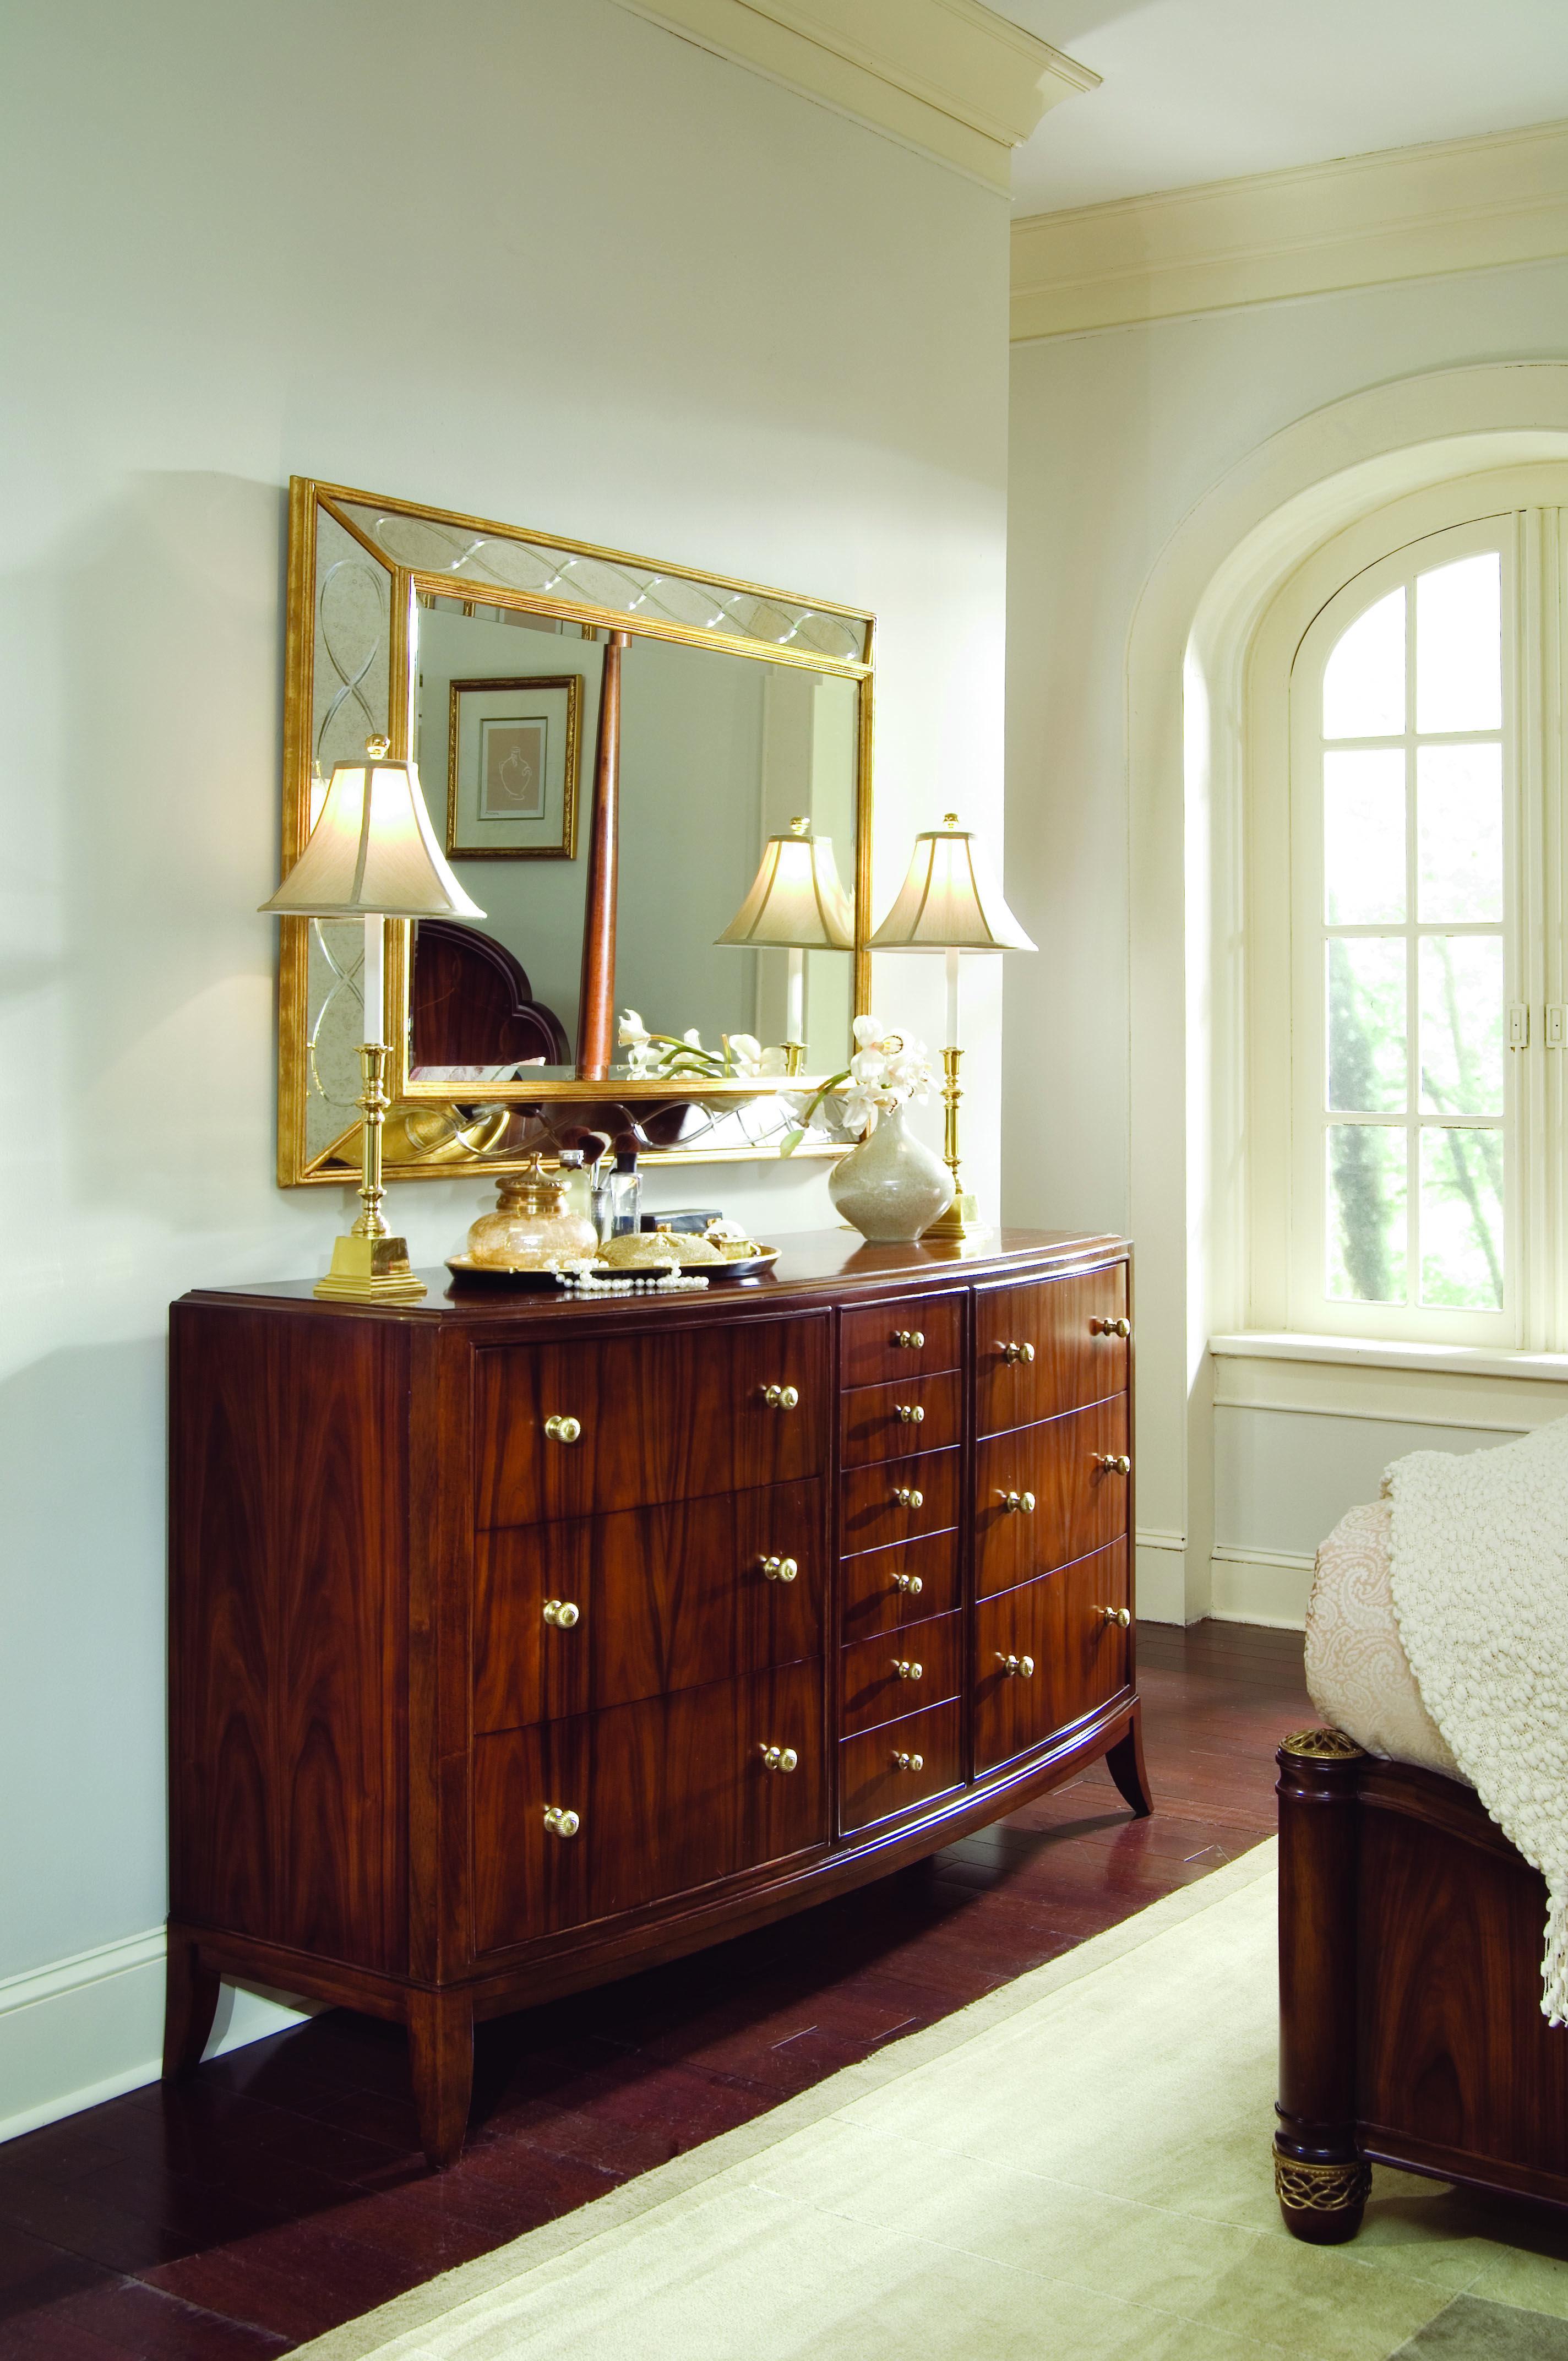 interiordesign design americandrew {via http//www.ad